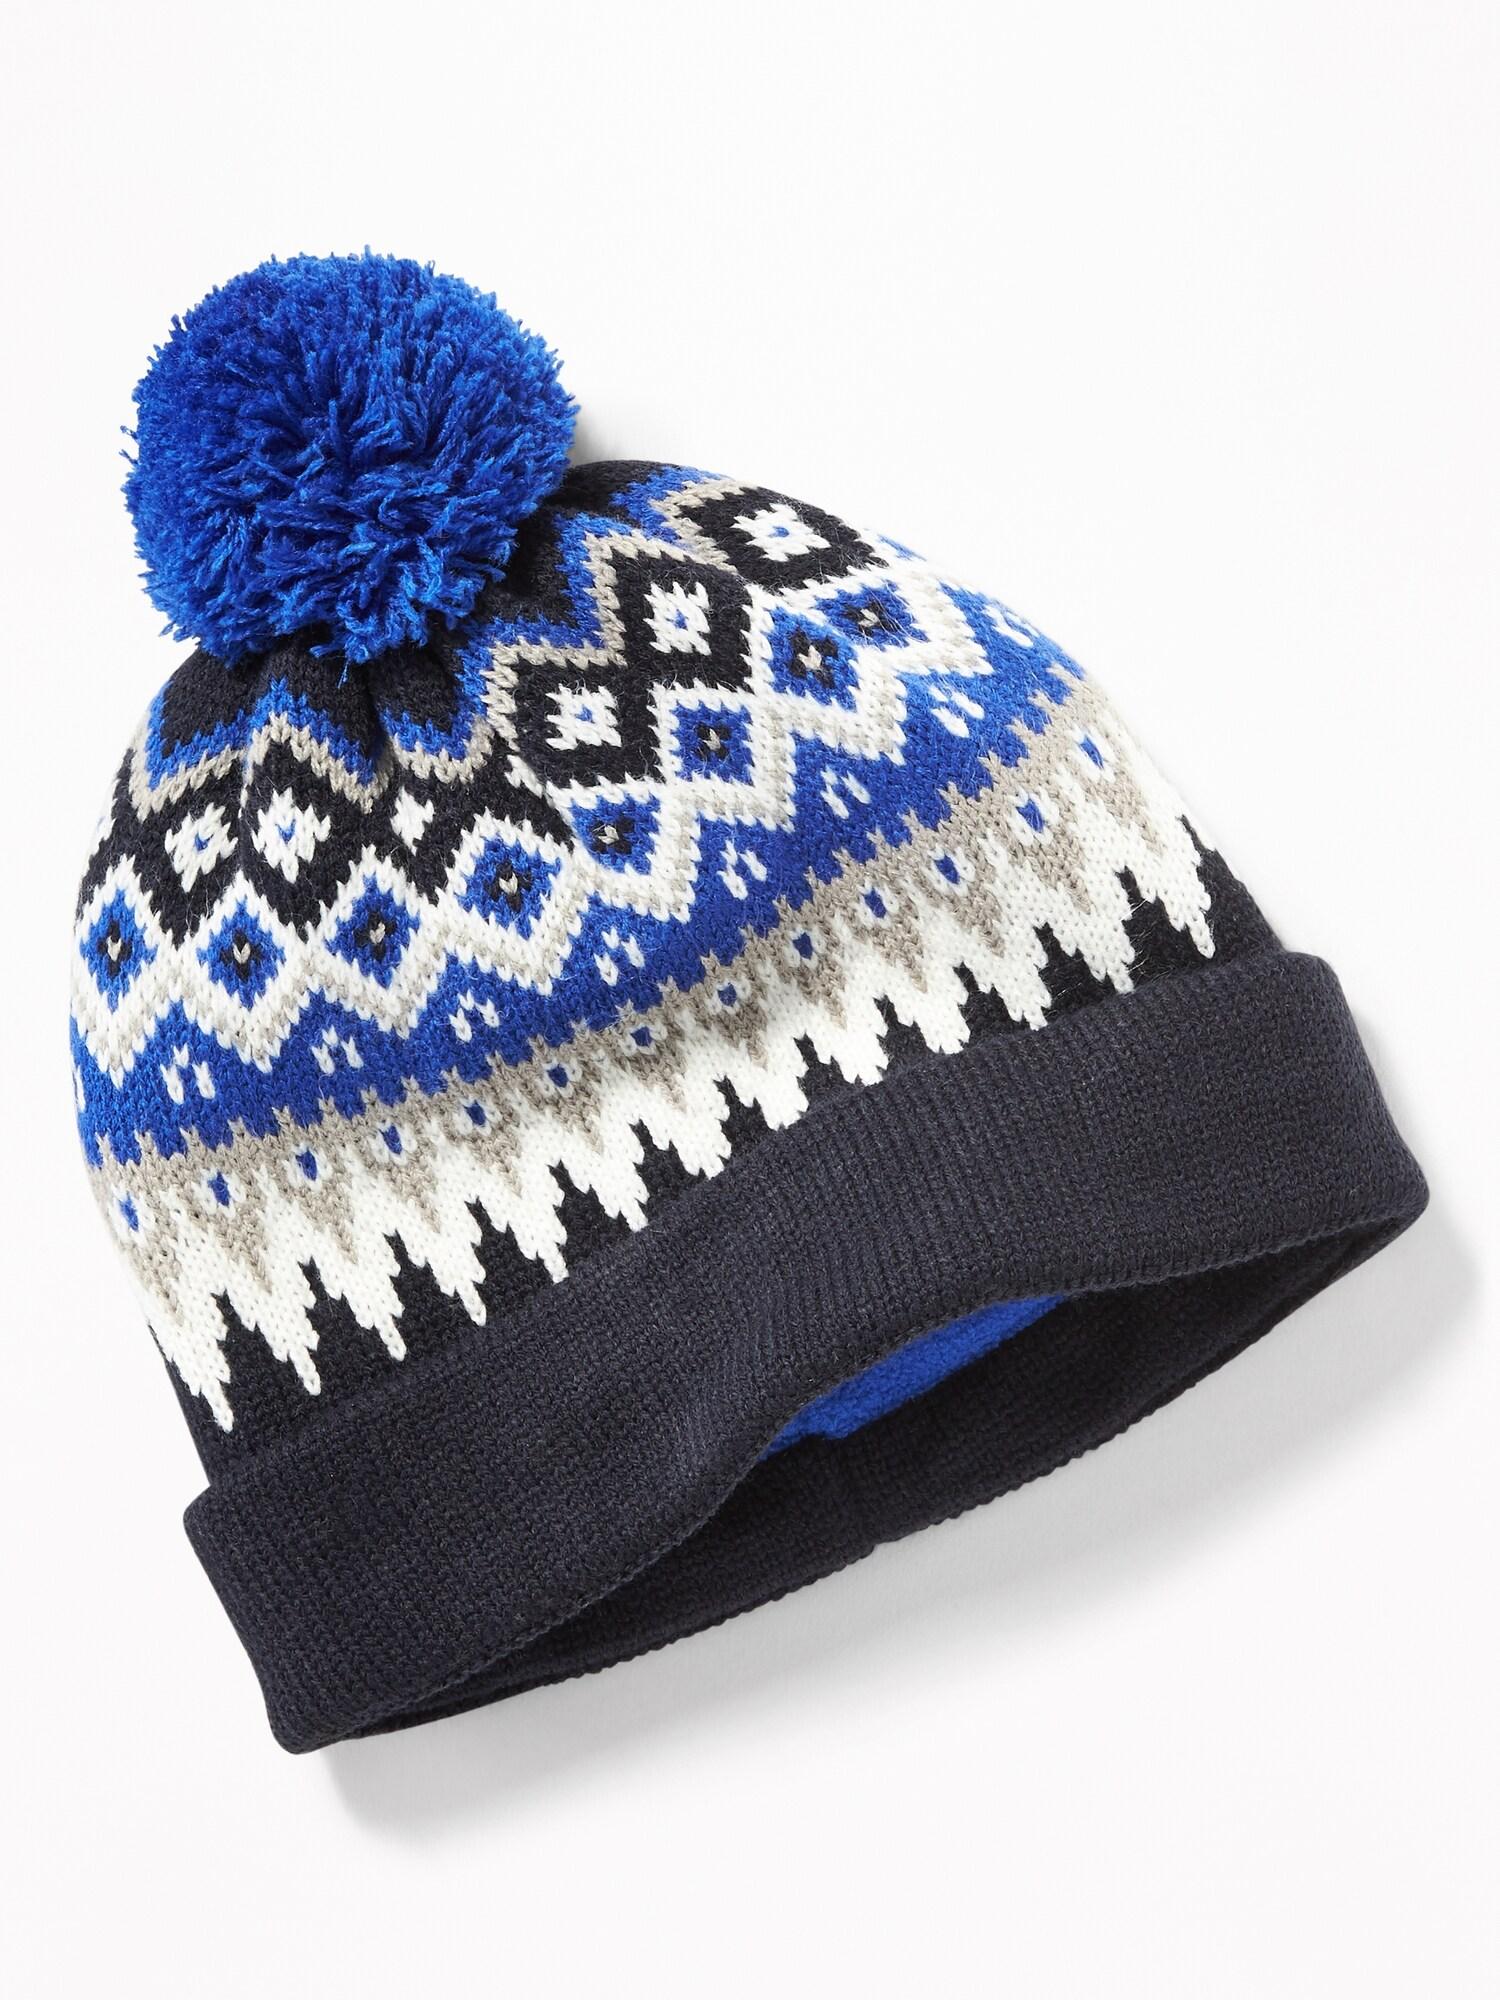 Sweater-Knit Pom-Pom Beanie for Boys  621e216c4b35